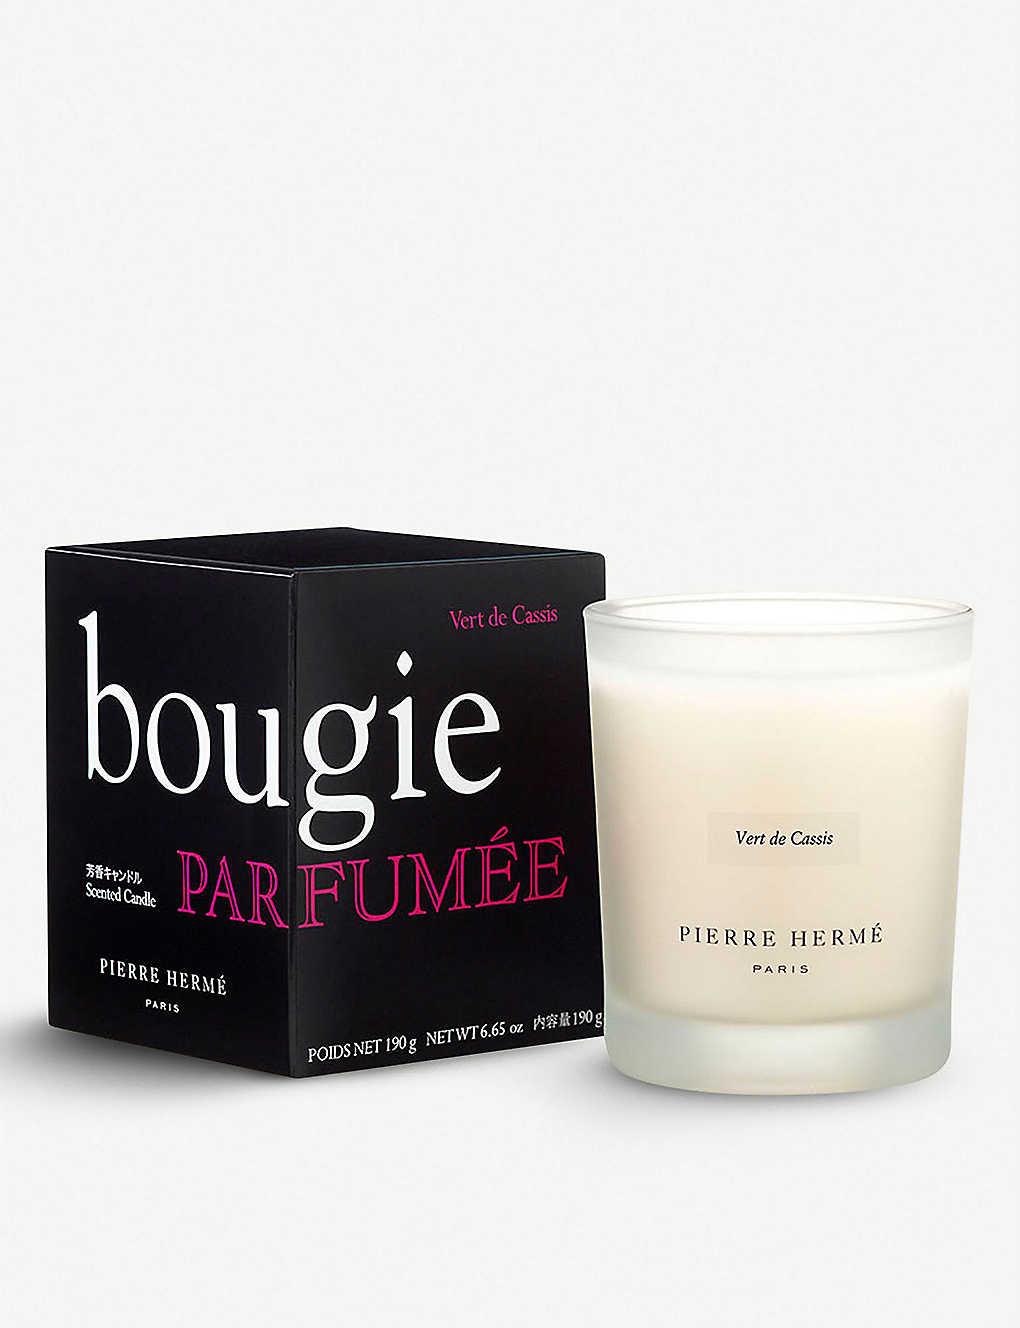 Vert de Cassis scented candle